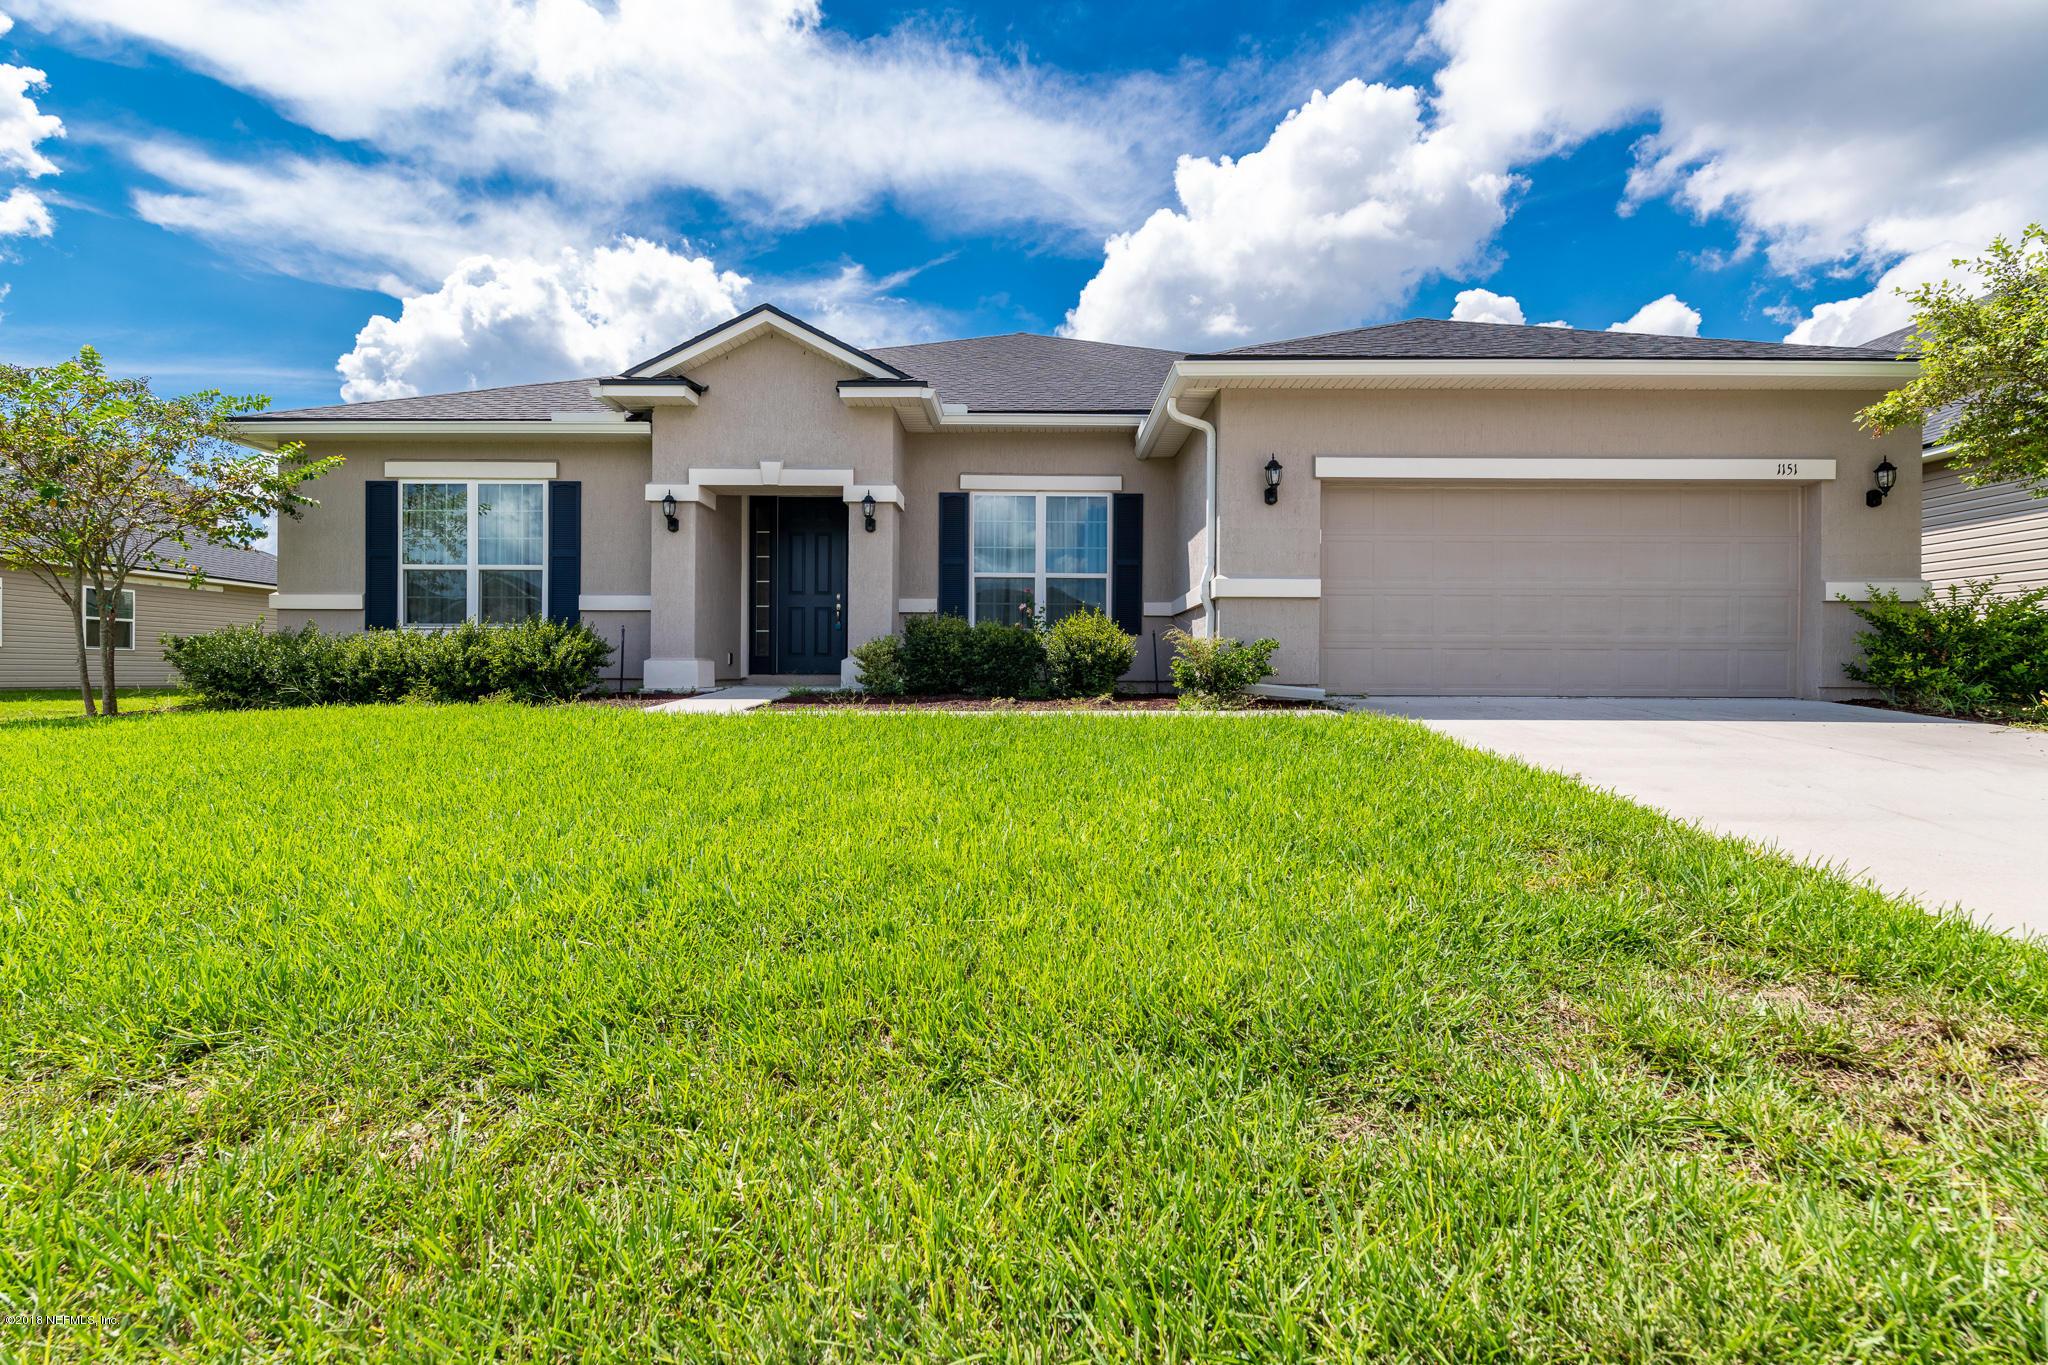 1151 WETLAND RIDGE, MIDDLEBURG, FLORIDA 32068, 4 Bedrooms Bedrooms, ,2 BathroomsBathrooms,Residential - single family,For sale,WETLAND RIDGE,957455